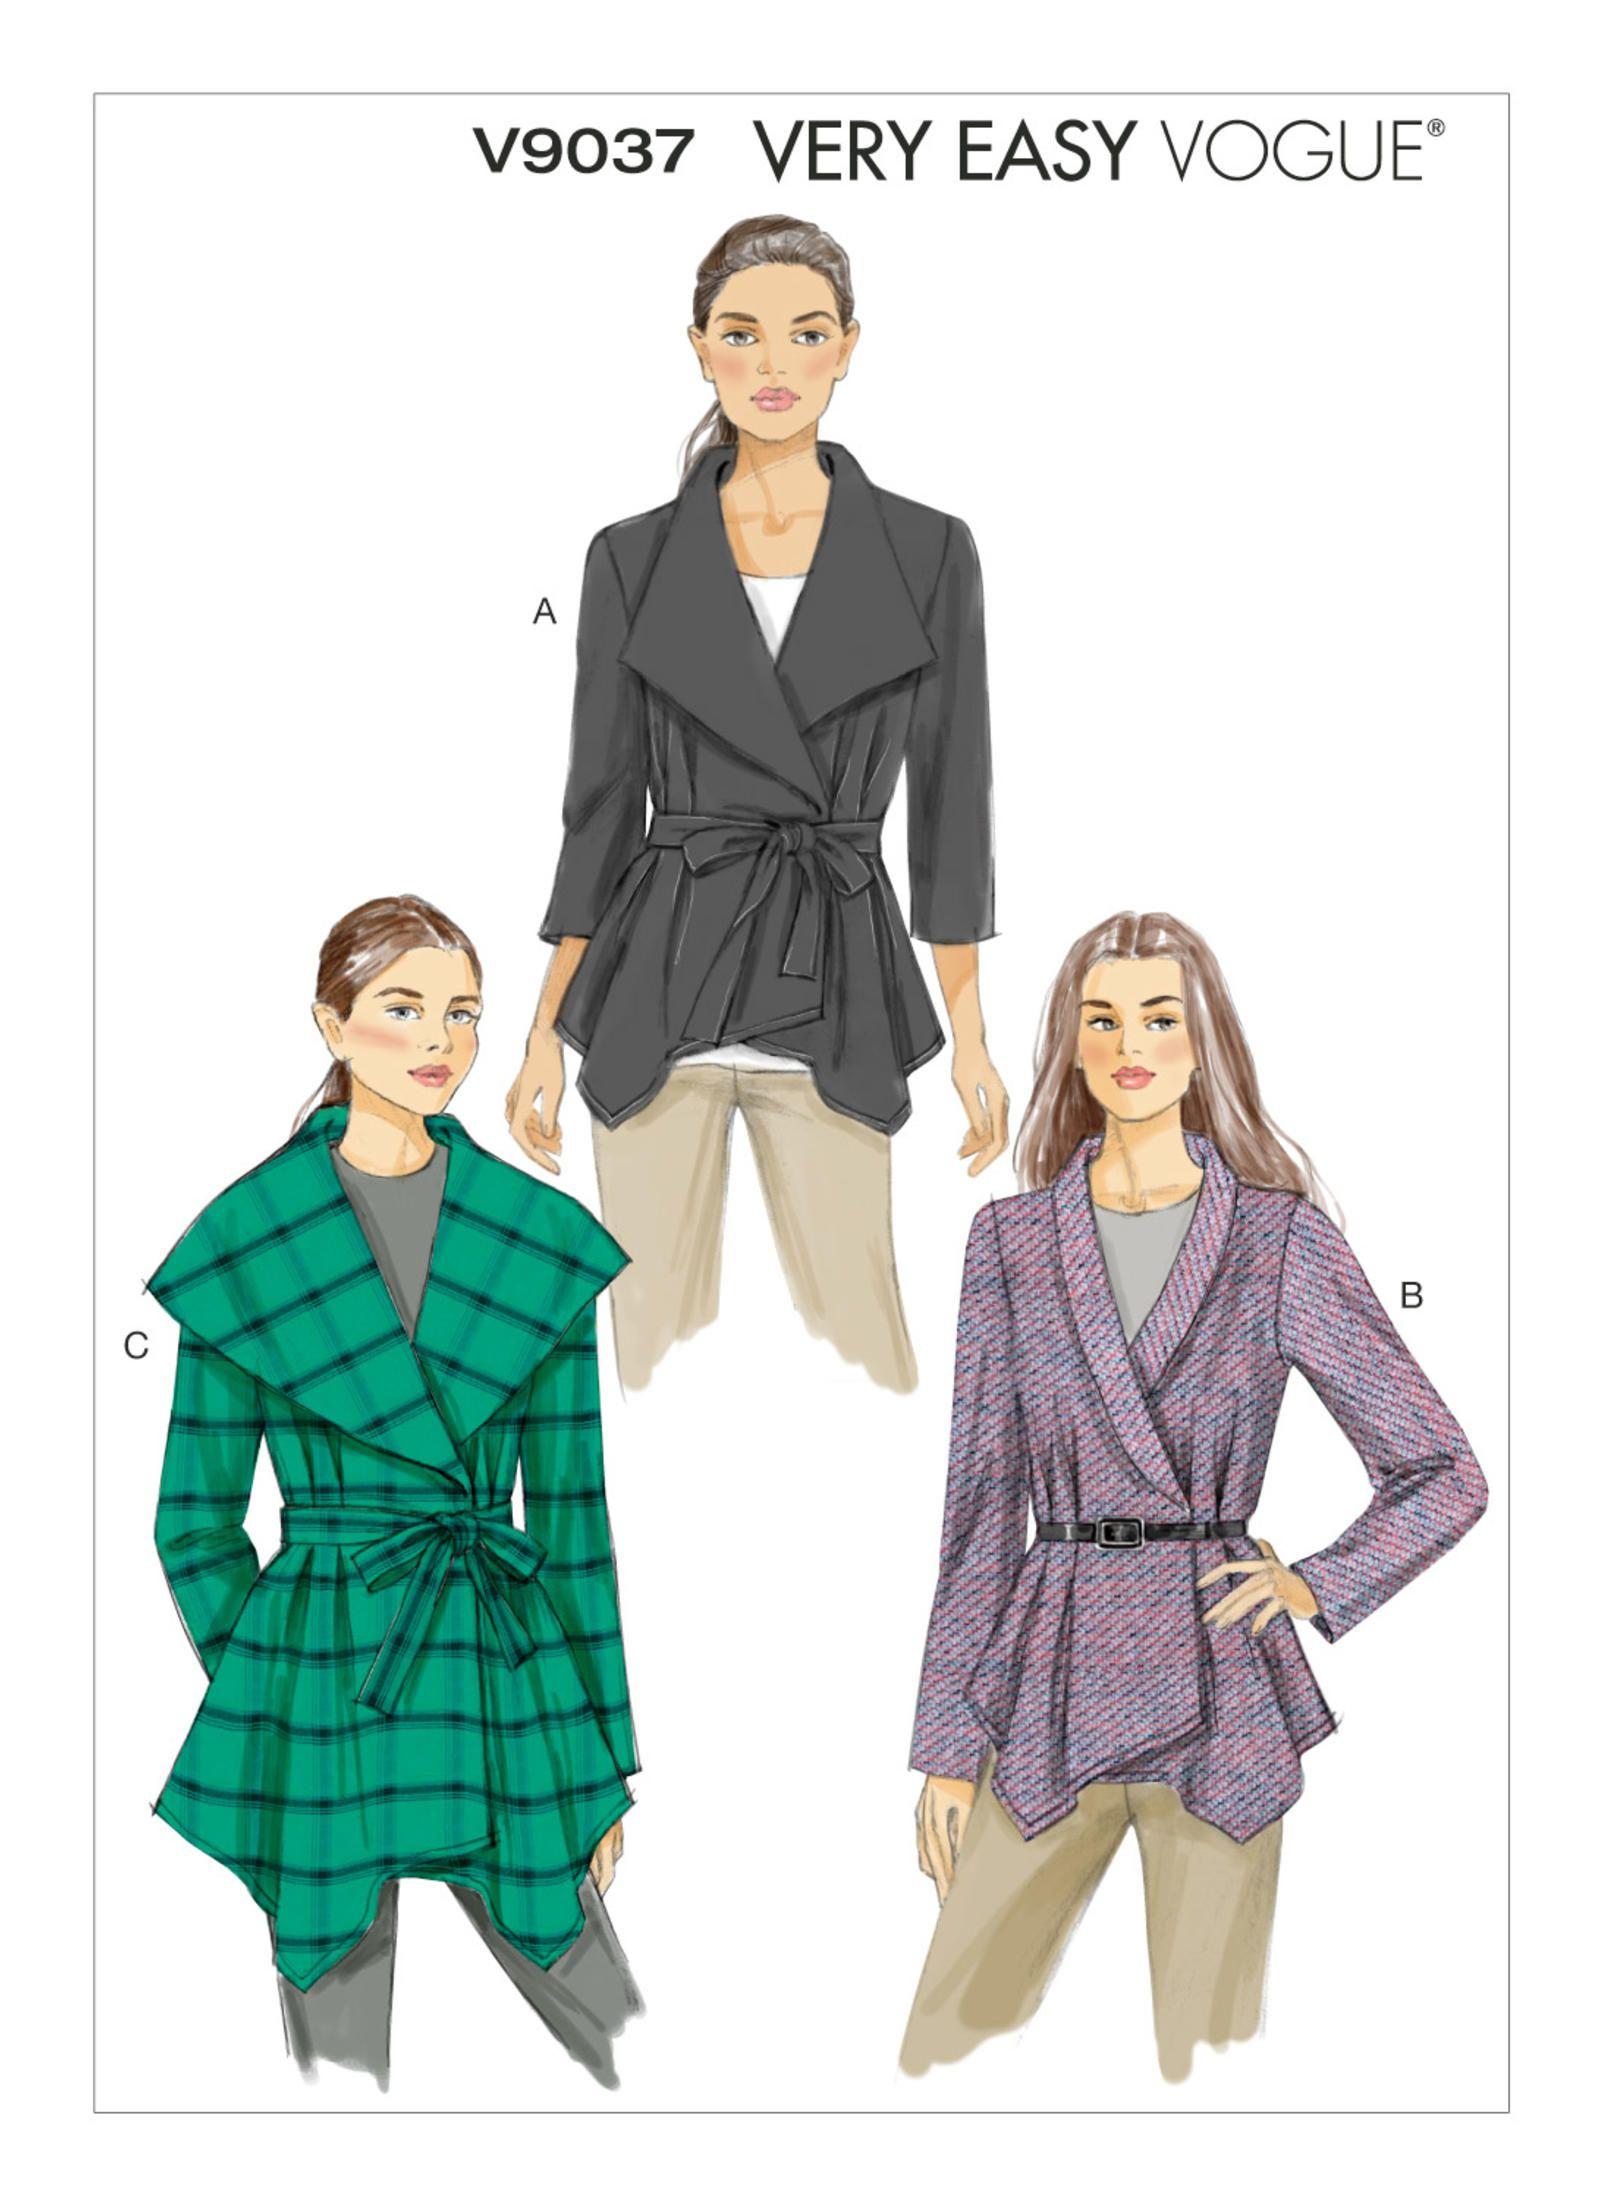 V9037 | Vogue Patterns | Crafting - Sewing Patterns | Pinterest